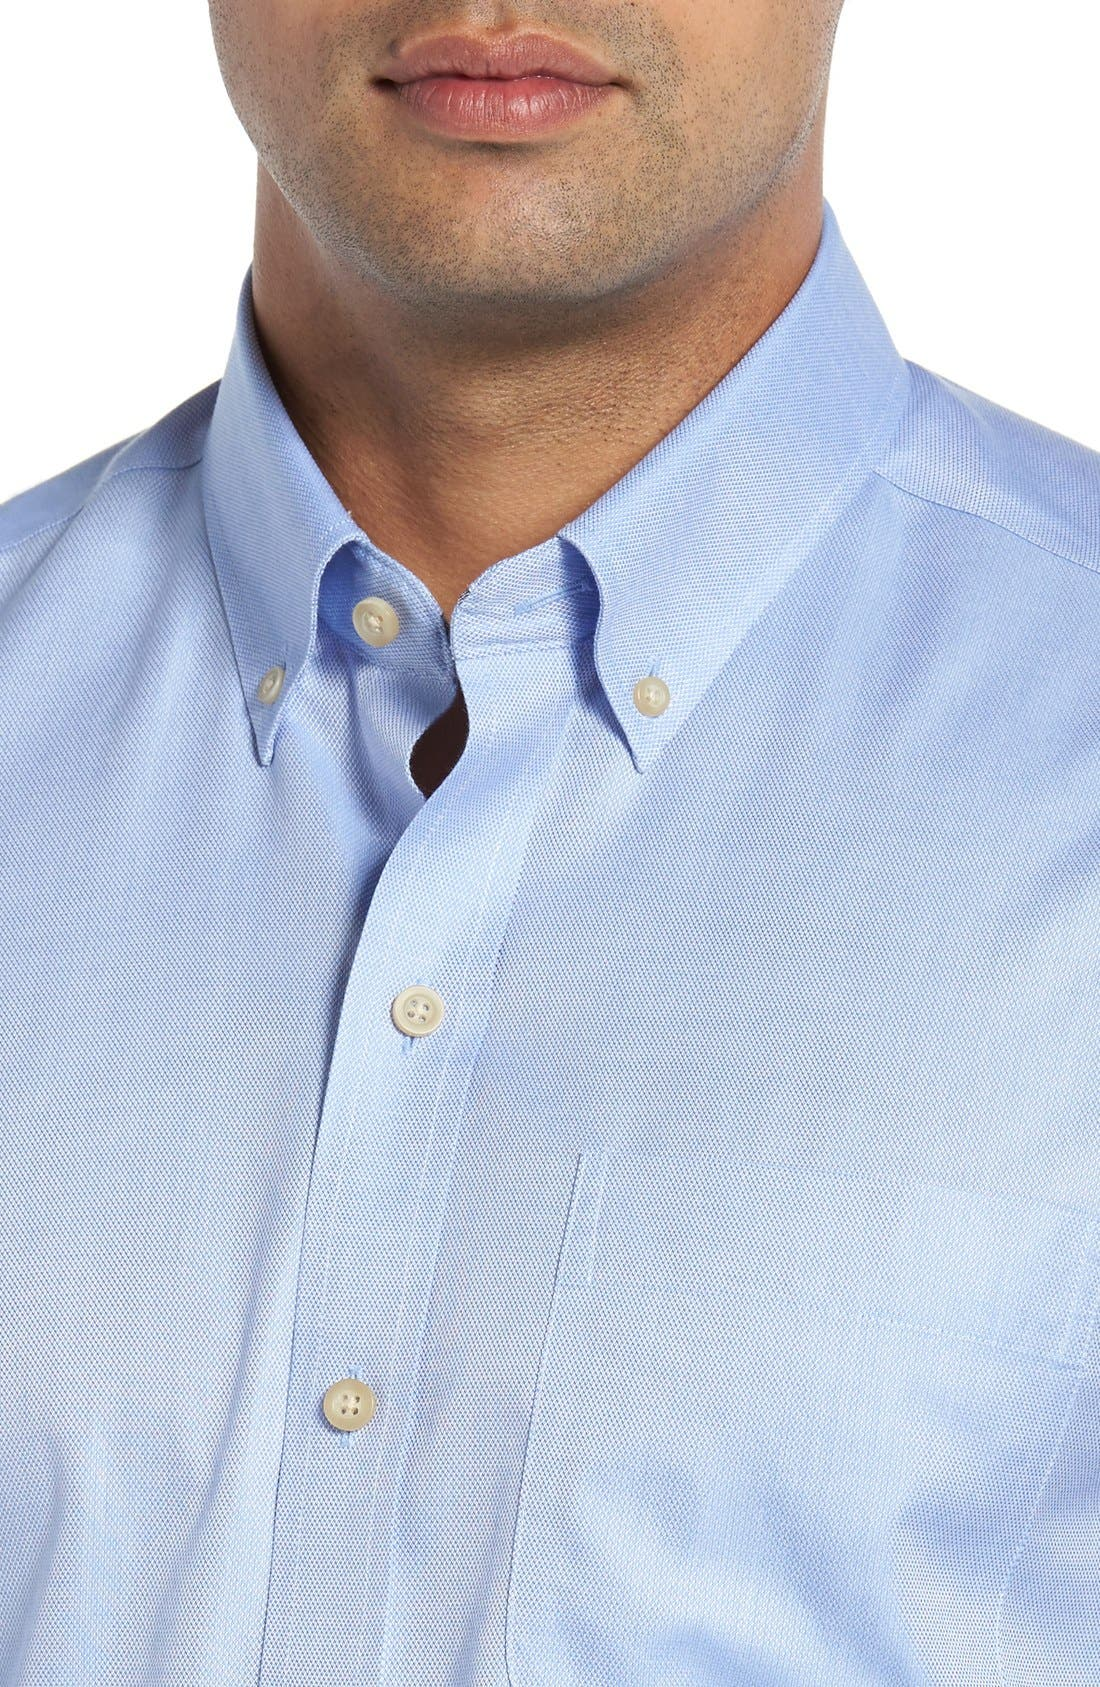 San Juan Classic Fit Wrinkle Free Solid Sport Shirt,                             Alternate thumbnail 4, color,                             Blue